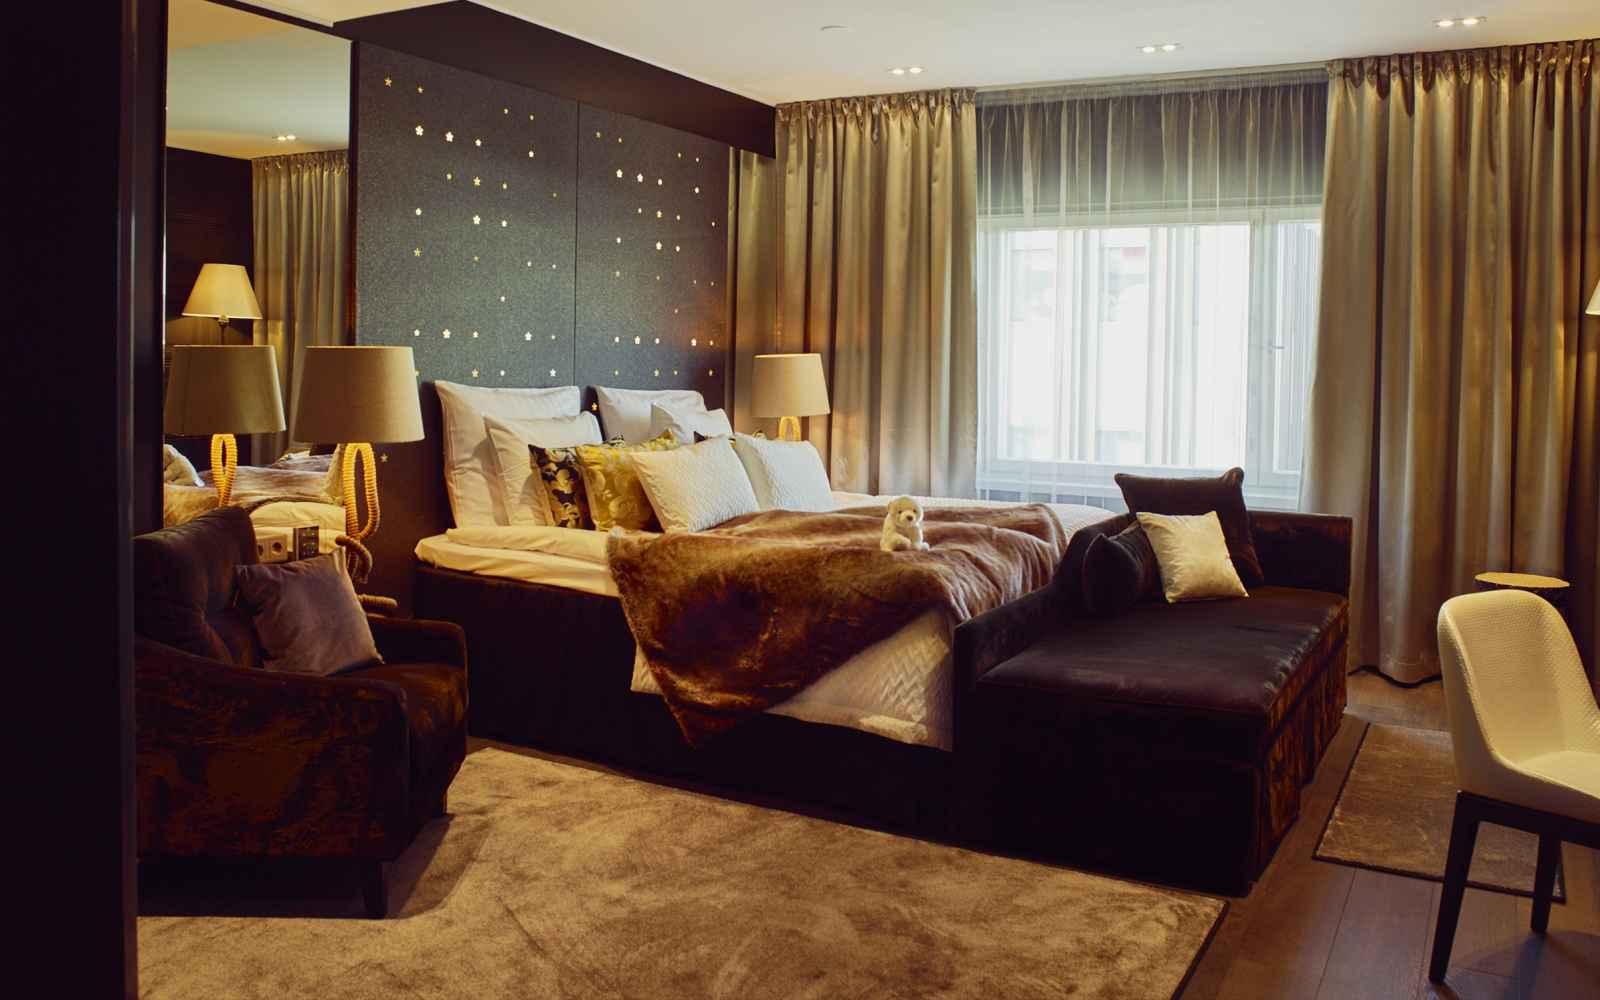 Arctic Light Hotel 8 jours / 7 nuits